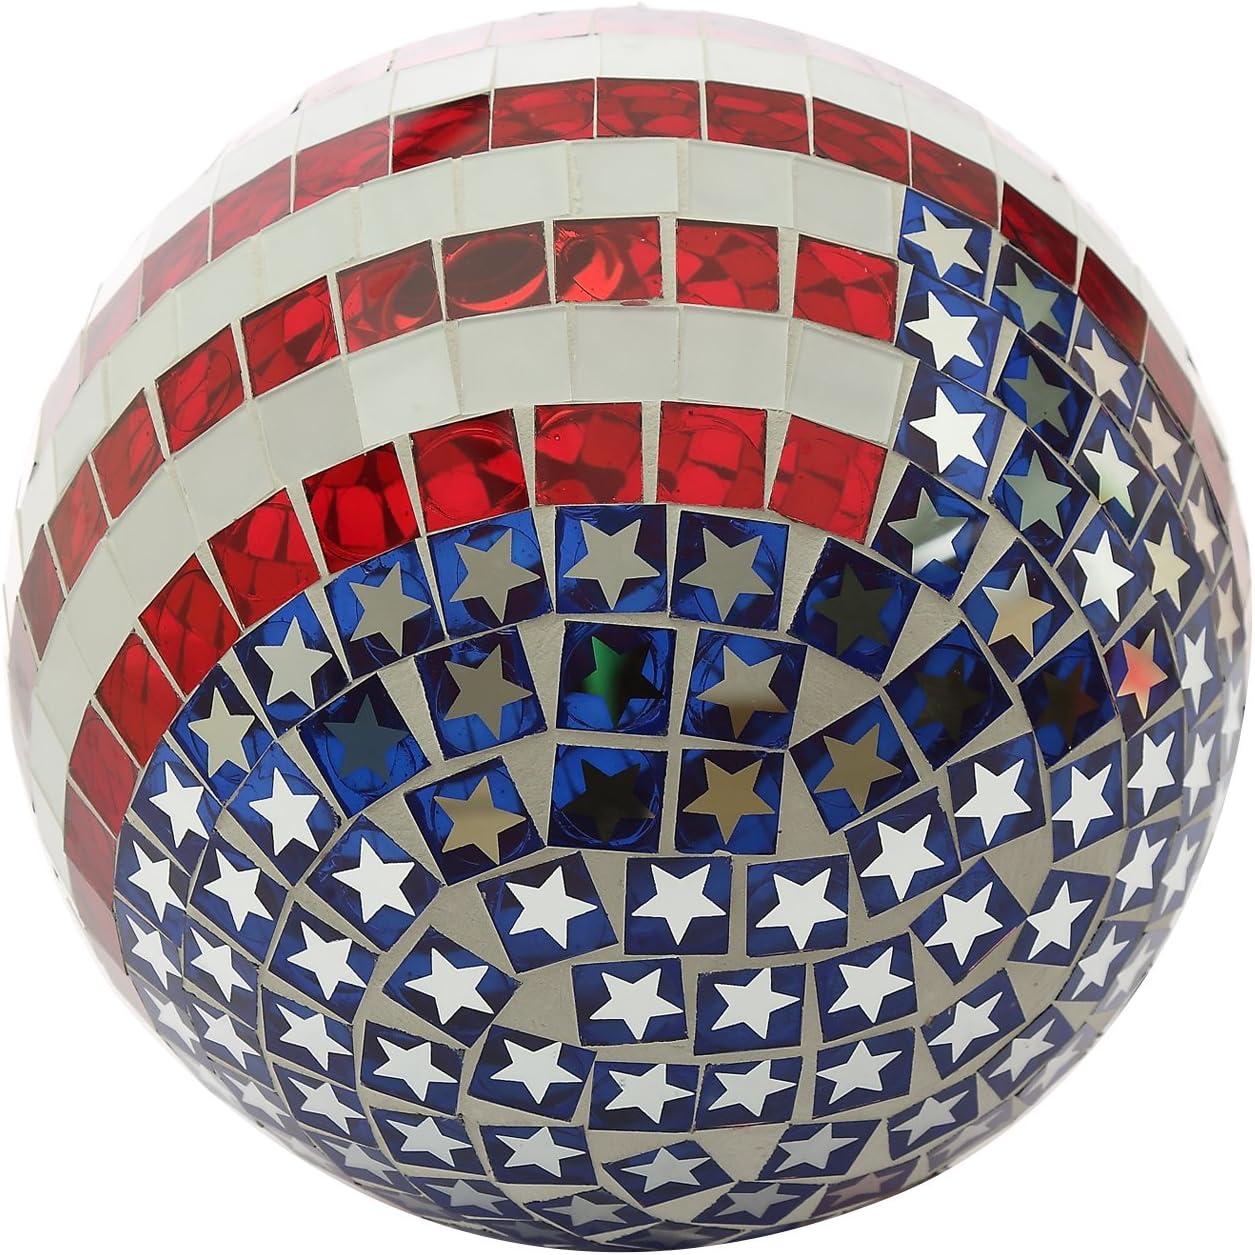 Echo Valley 1776 10-Inch Patriotic Glass Mosaic Gazing Globe Stars and Stripes